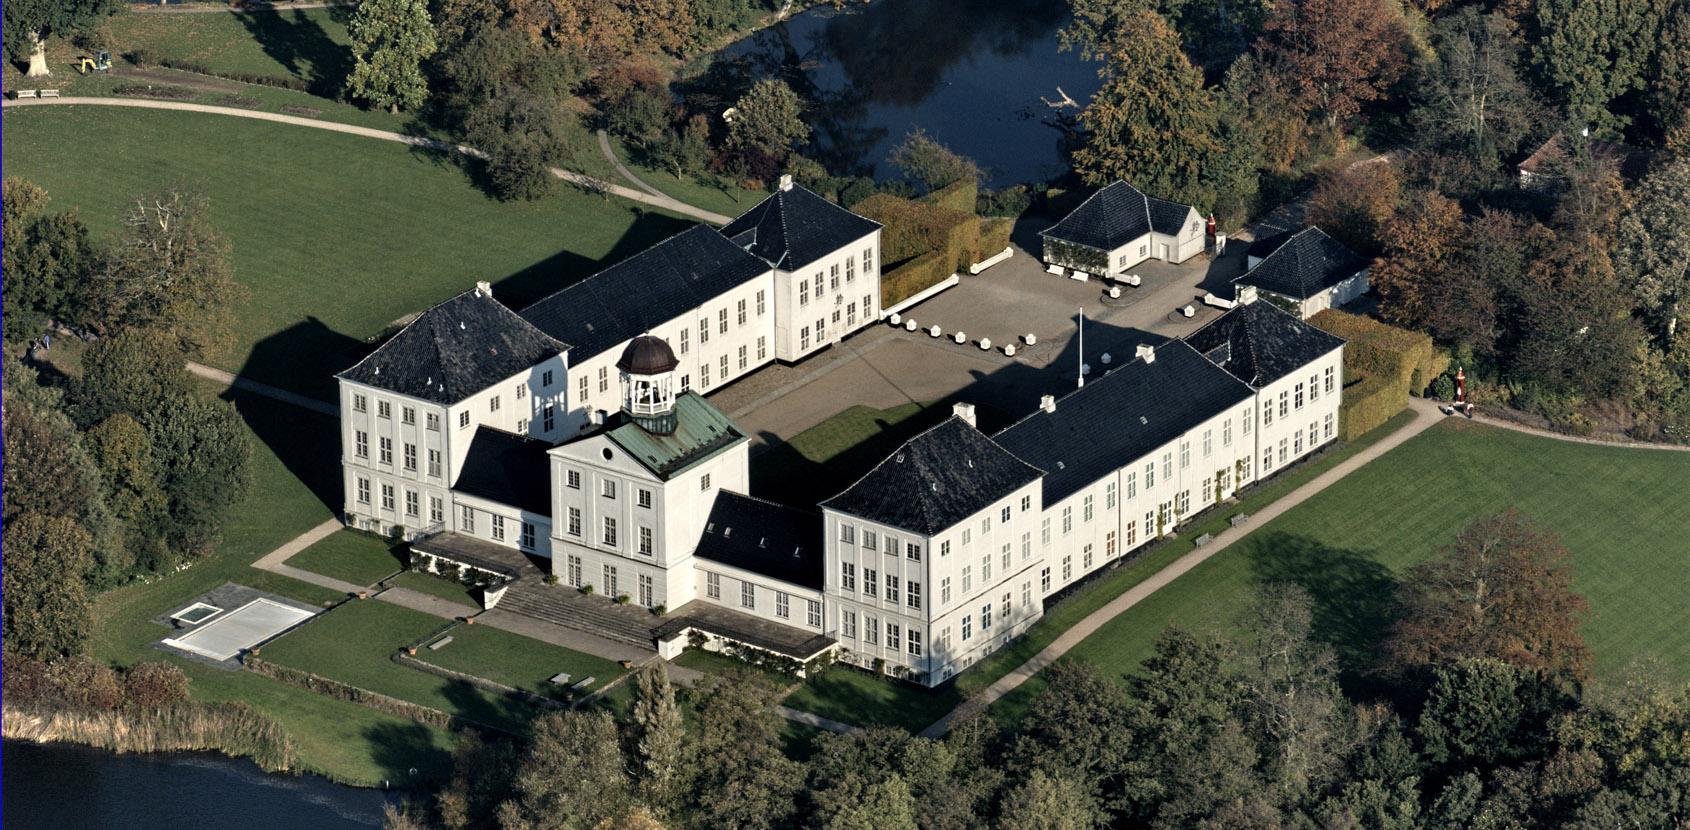 Luftfoto af Gråsten Slot. Foto: Finn Christoffersen